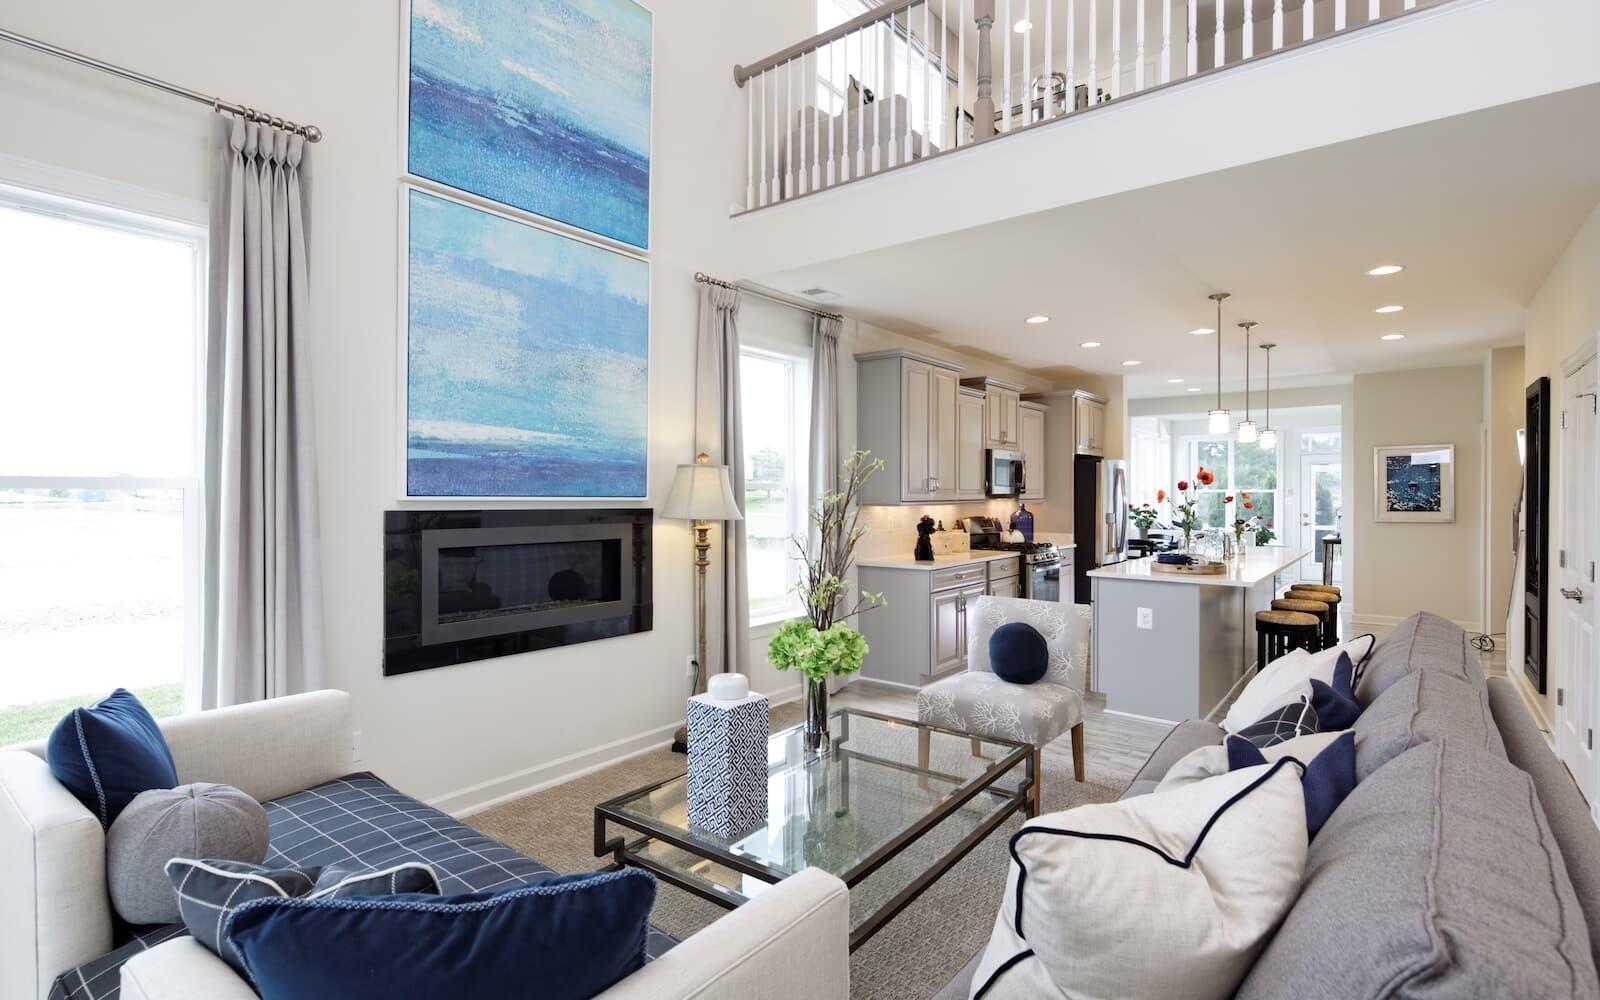 BridgeportII-living-room-single-family-home-easton-md-easton-village-brookfield-residential.jpg